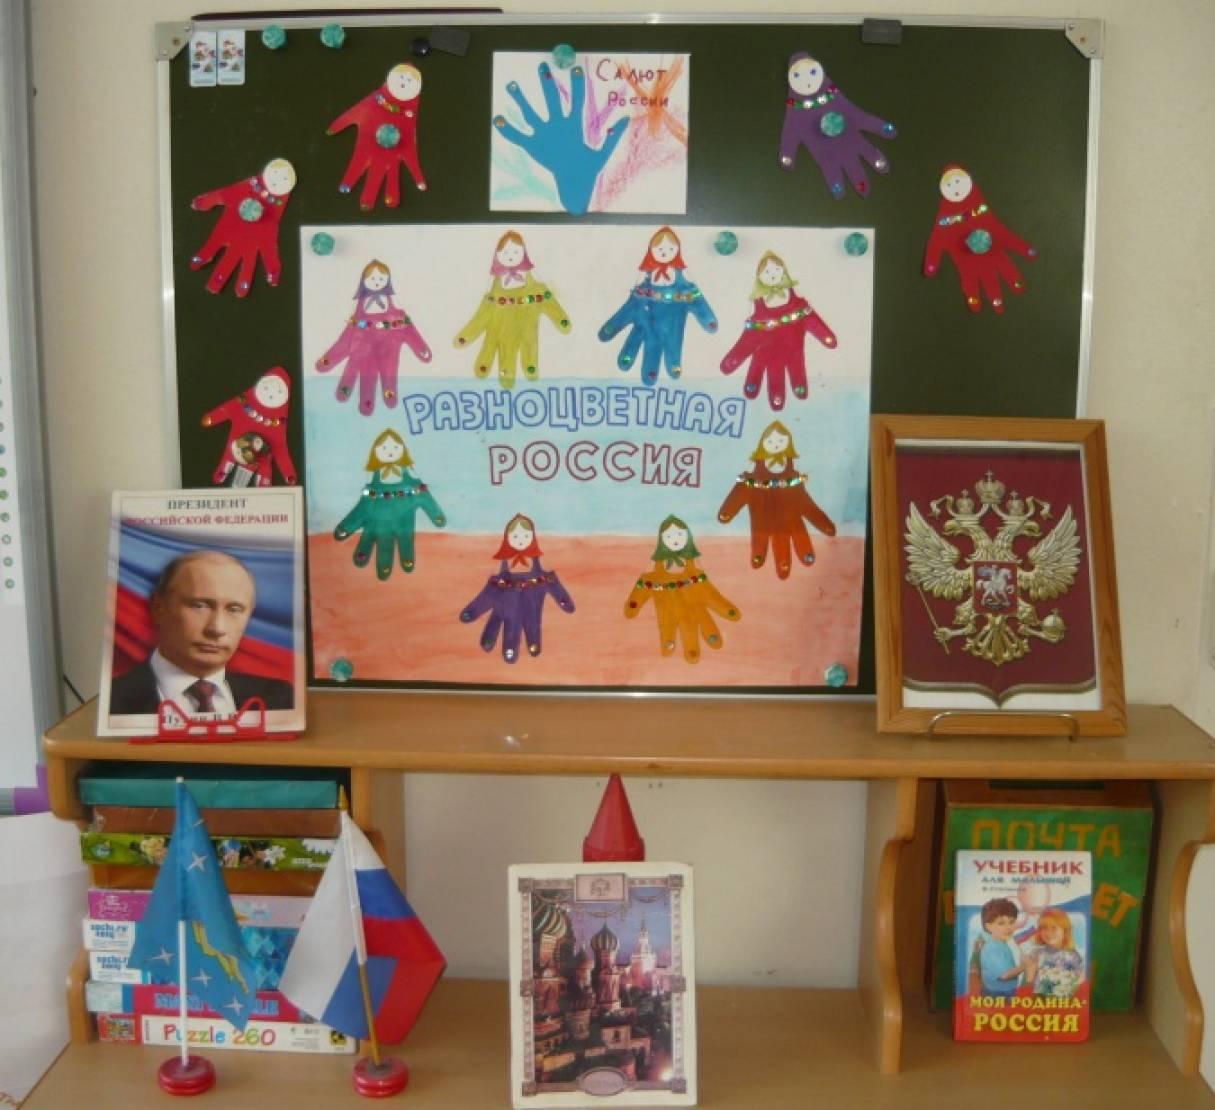 999x555 151kb Jpeg: Поделки дети россии